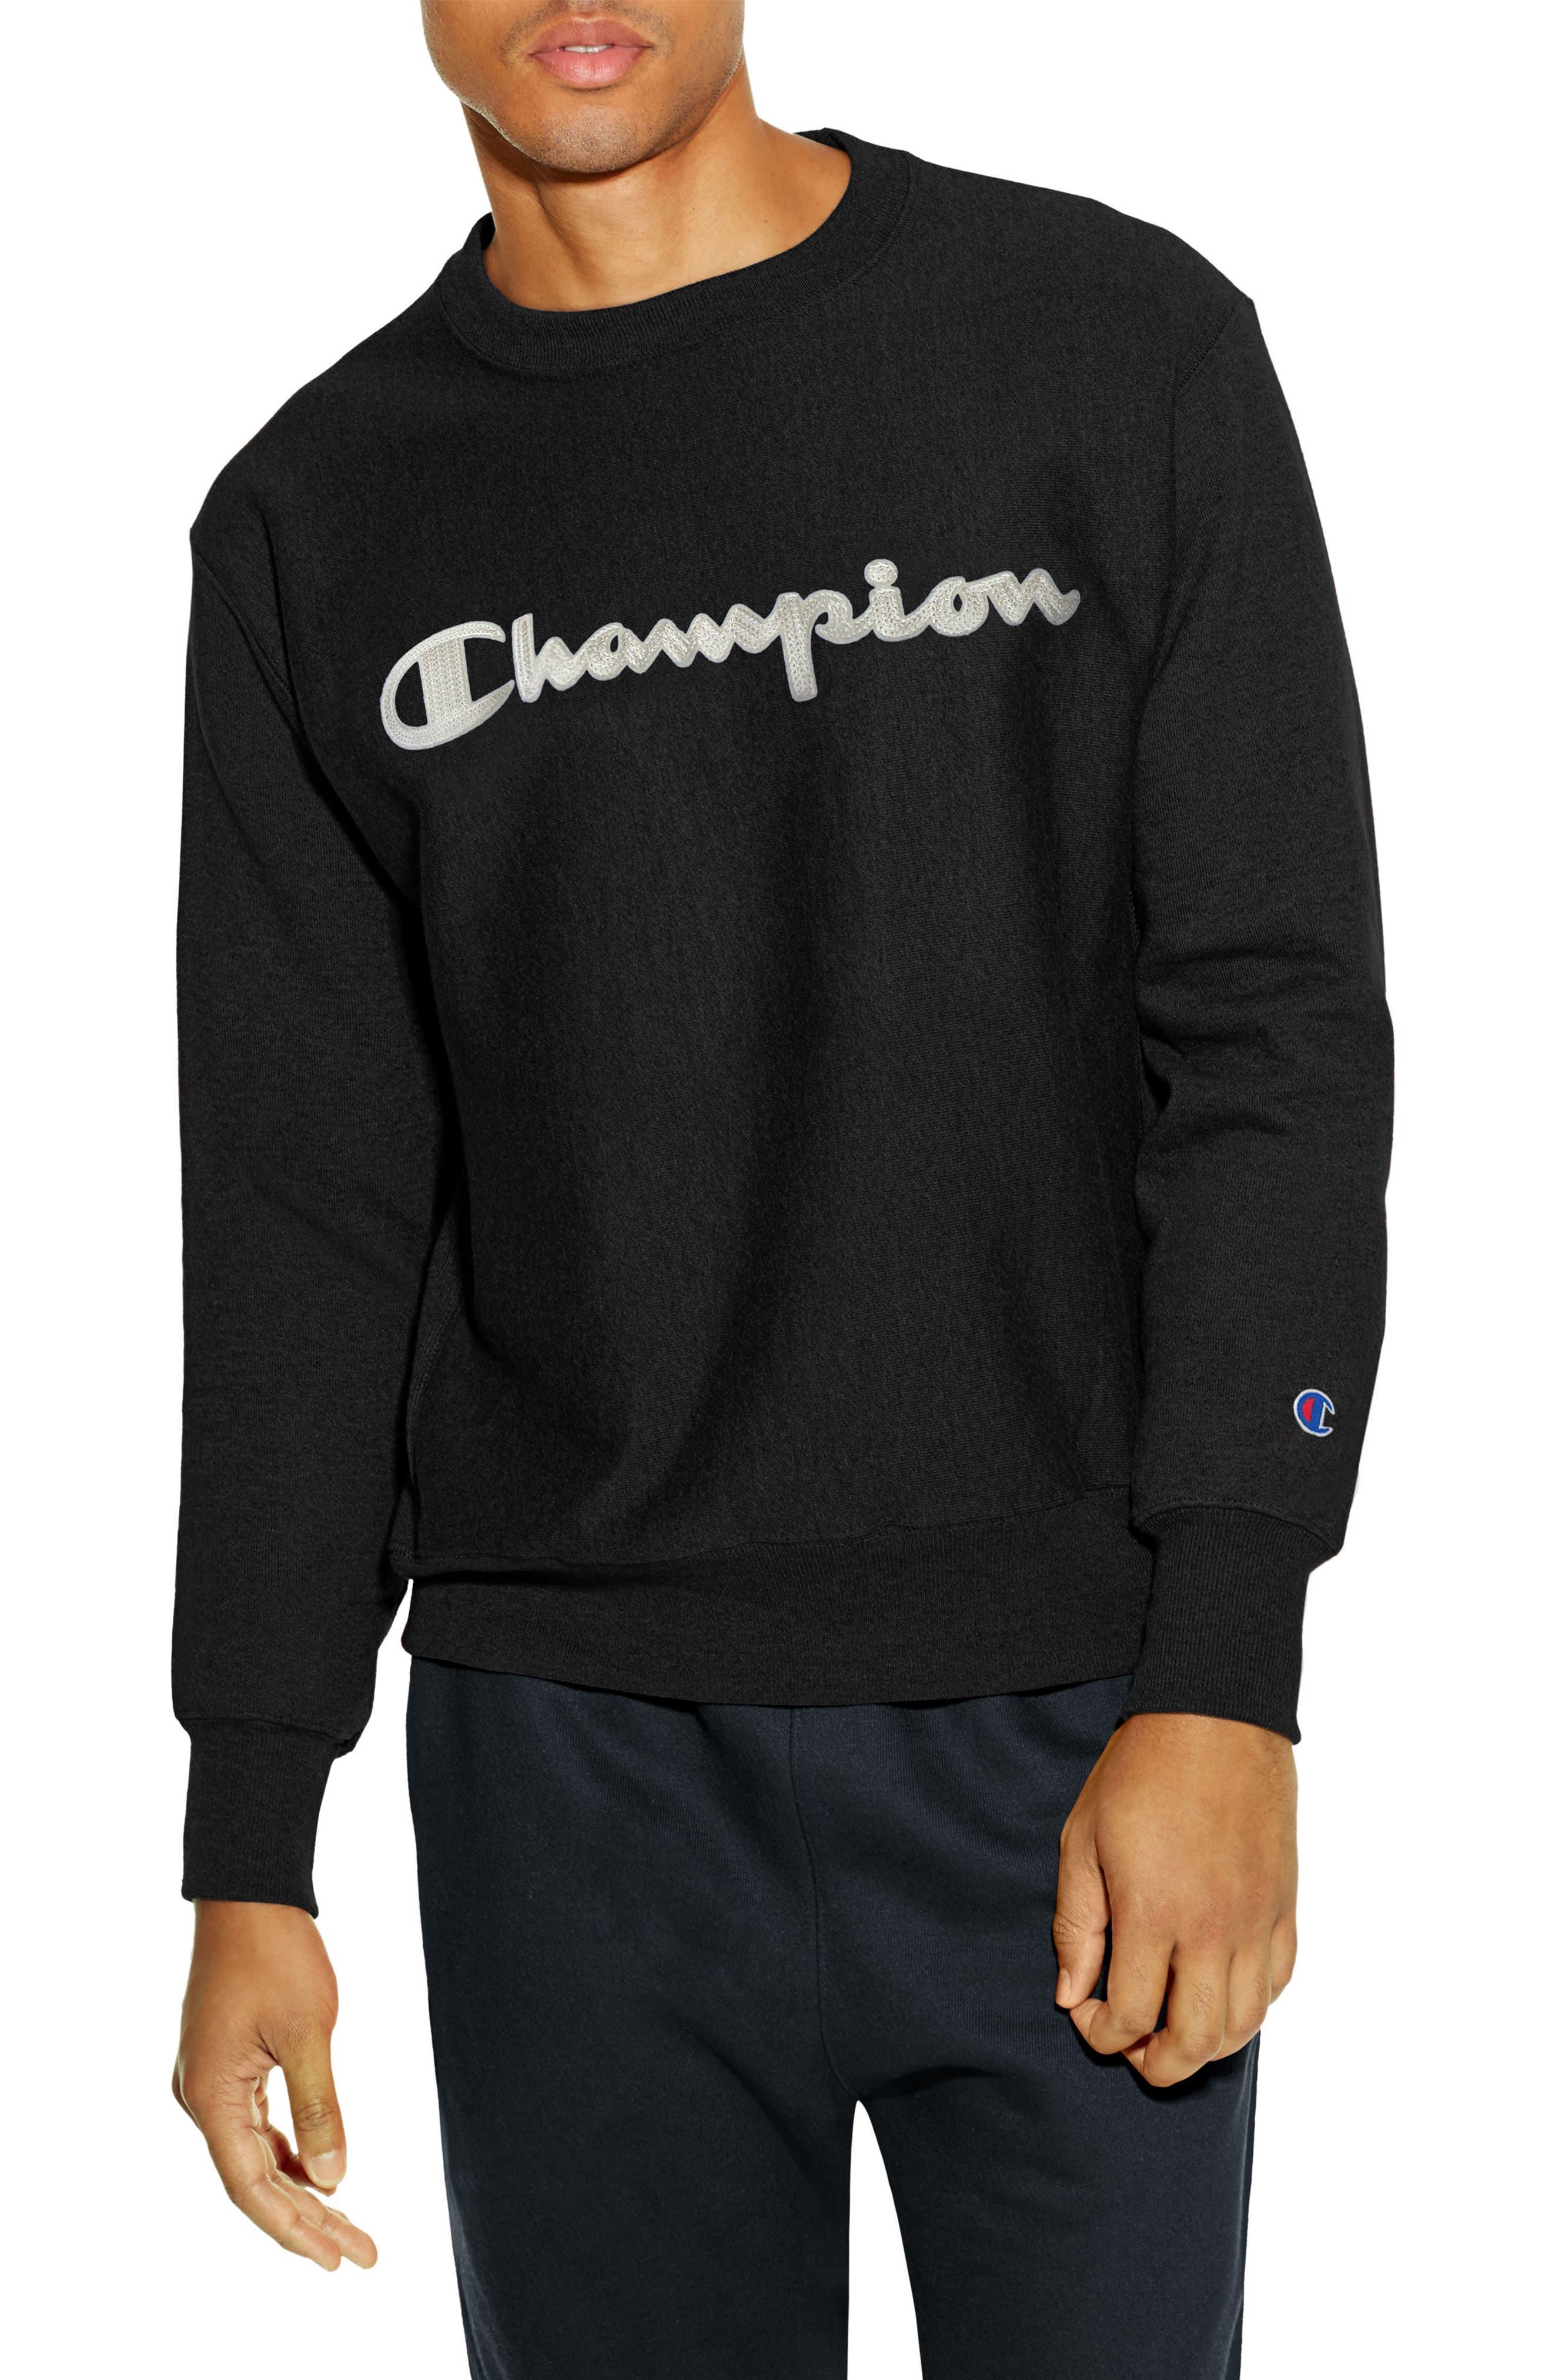 Champion Reverse Weave Crewneck Cotton Blend Sweatshirt